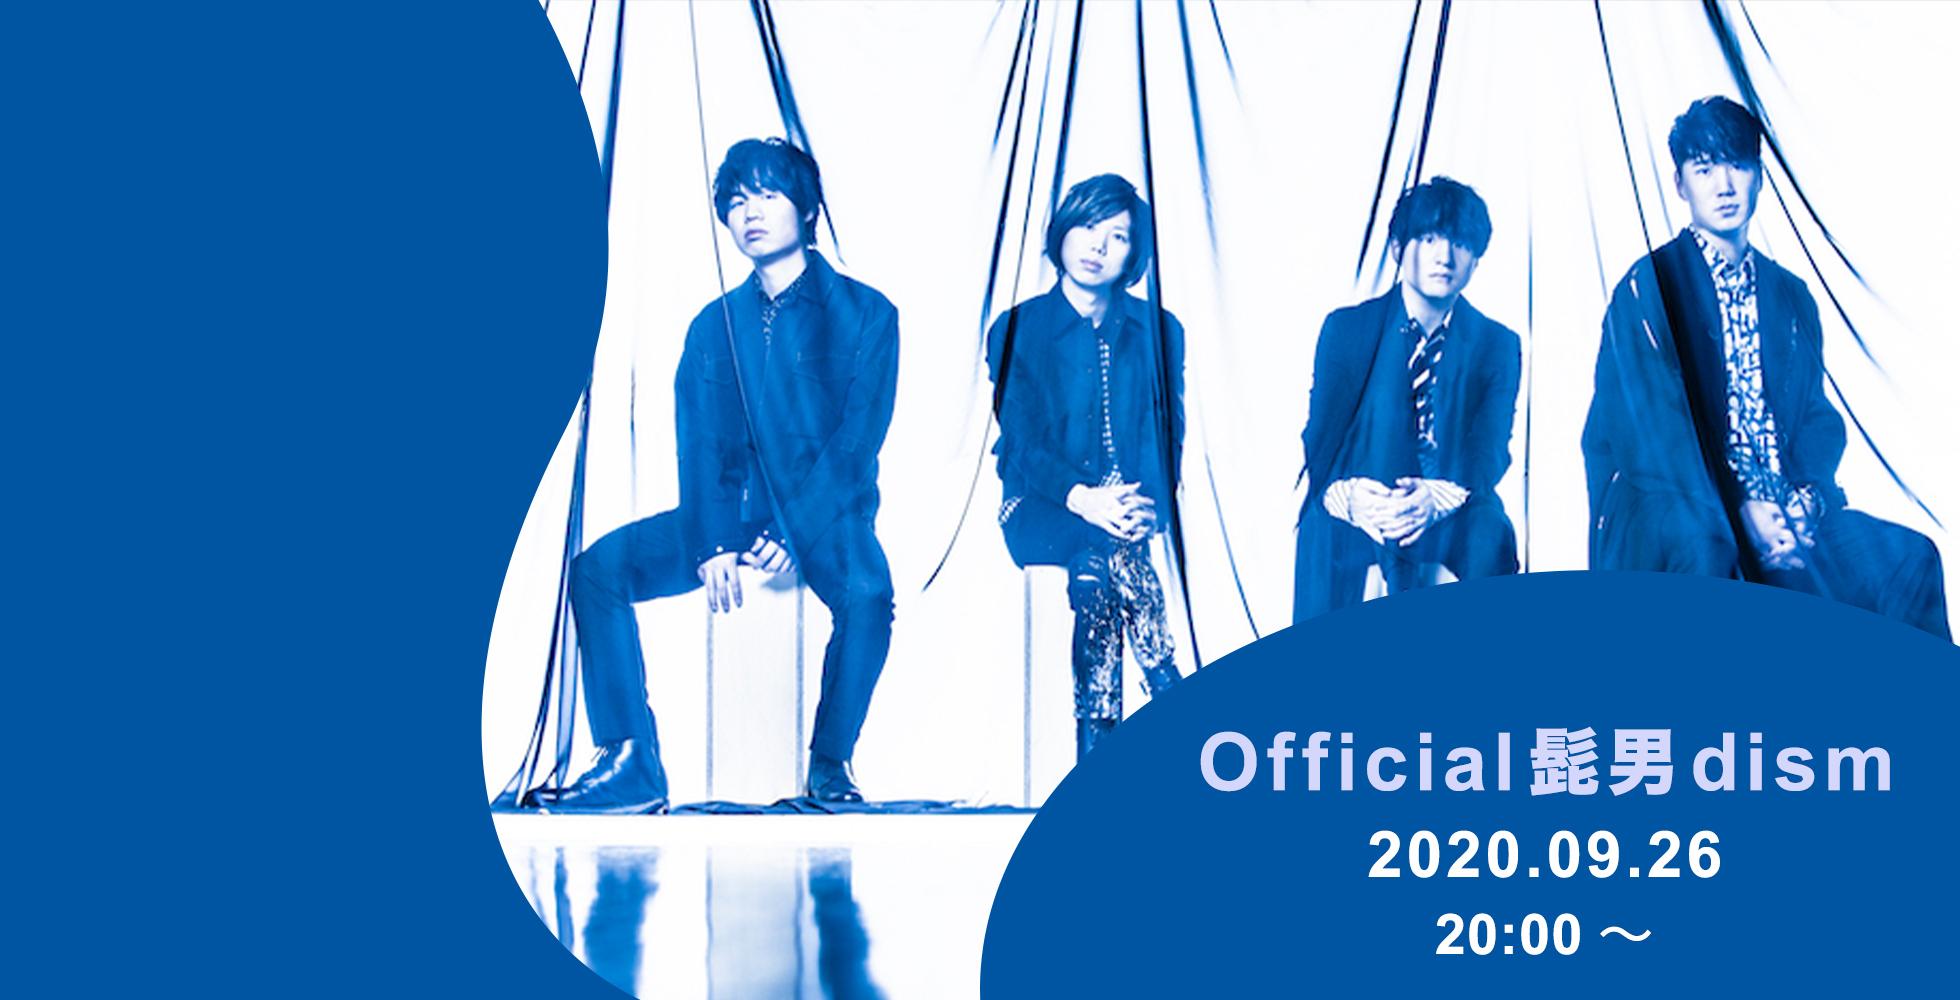 Official髭男dism ONLINE LIVE 2020 - Arena Travelers -